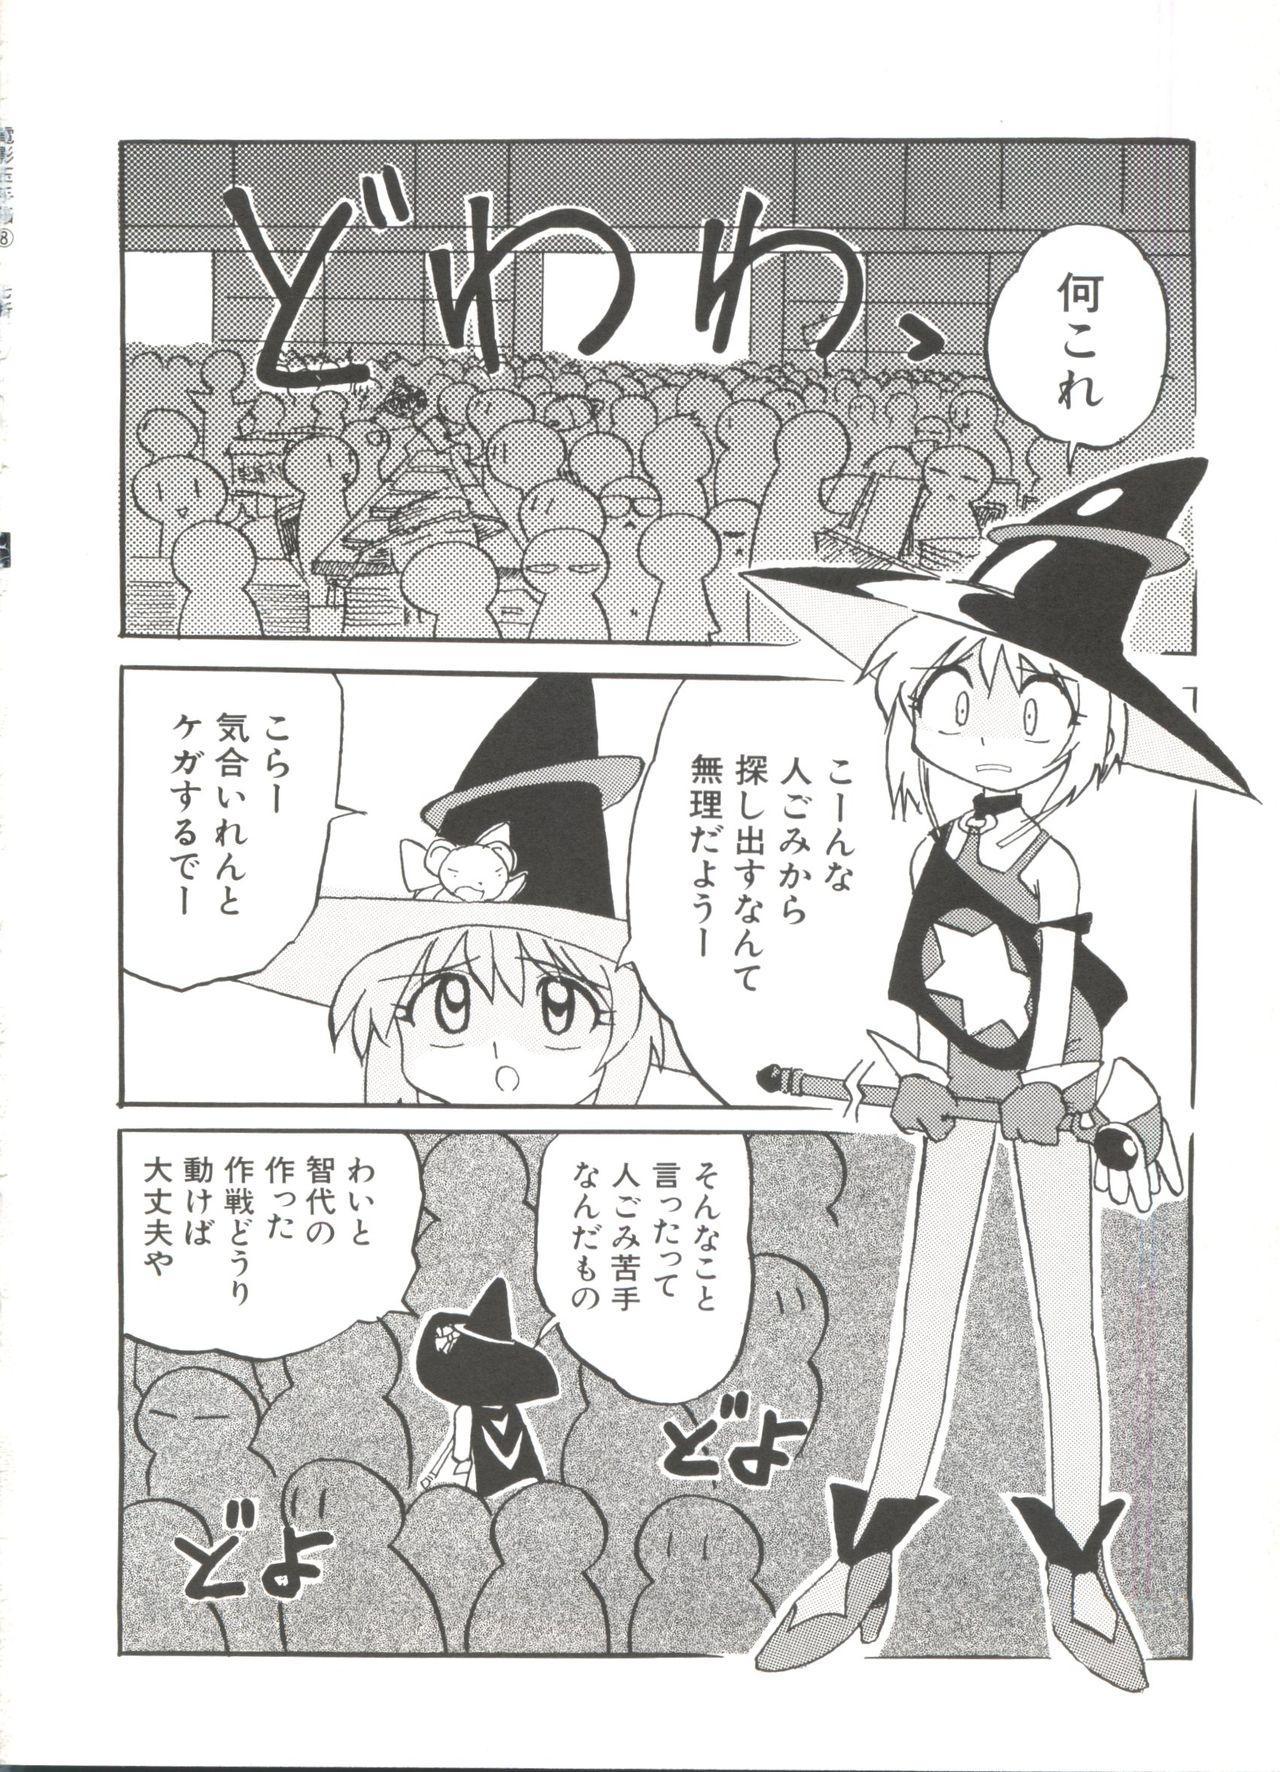 [Anthology] Denei Tamatebako 8 - Utakata no Tenshi-tachi II (Various) 113